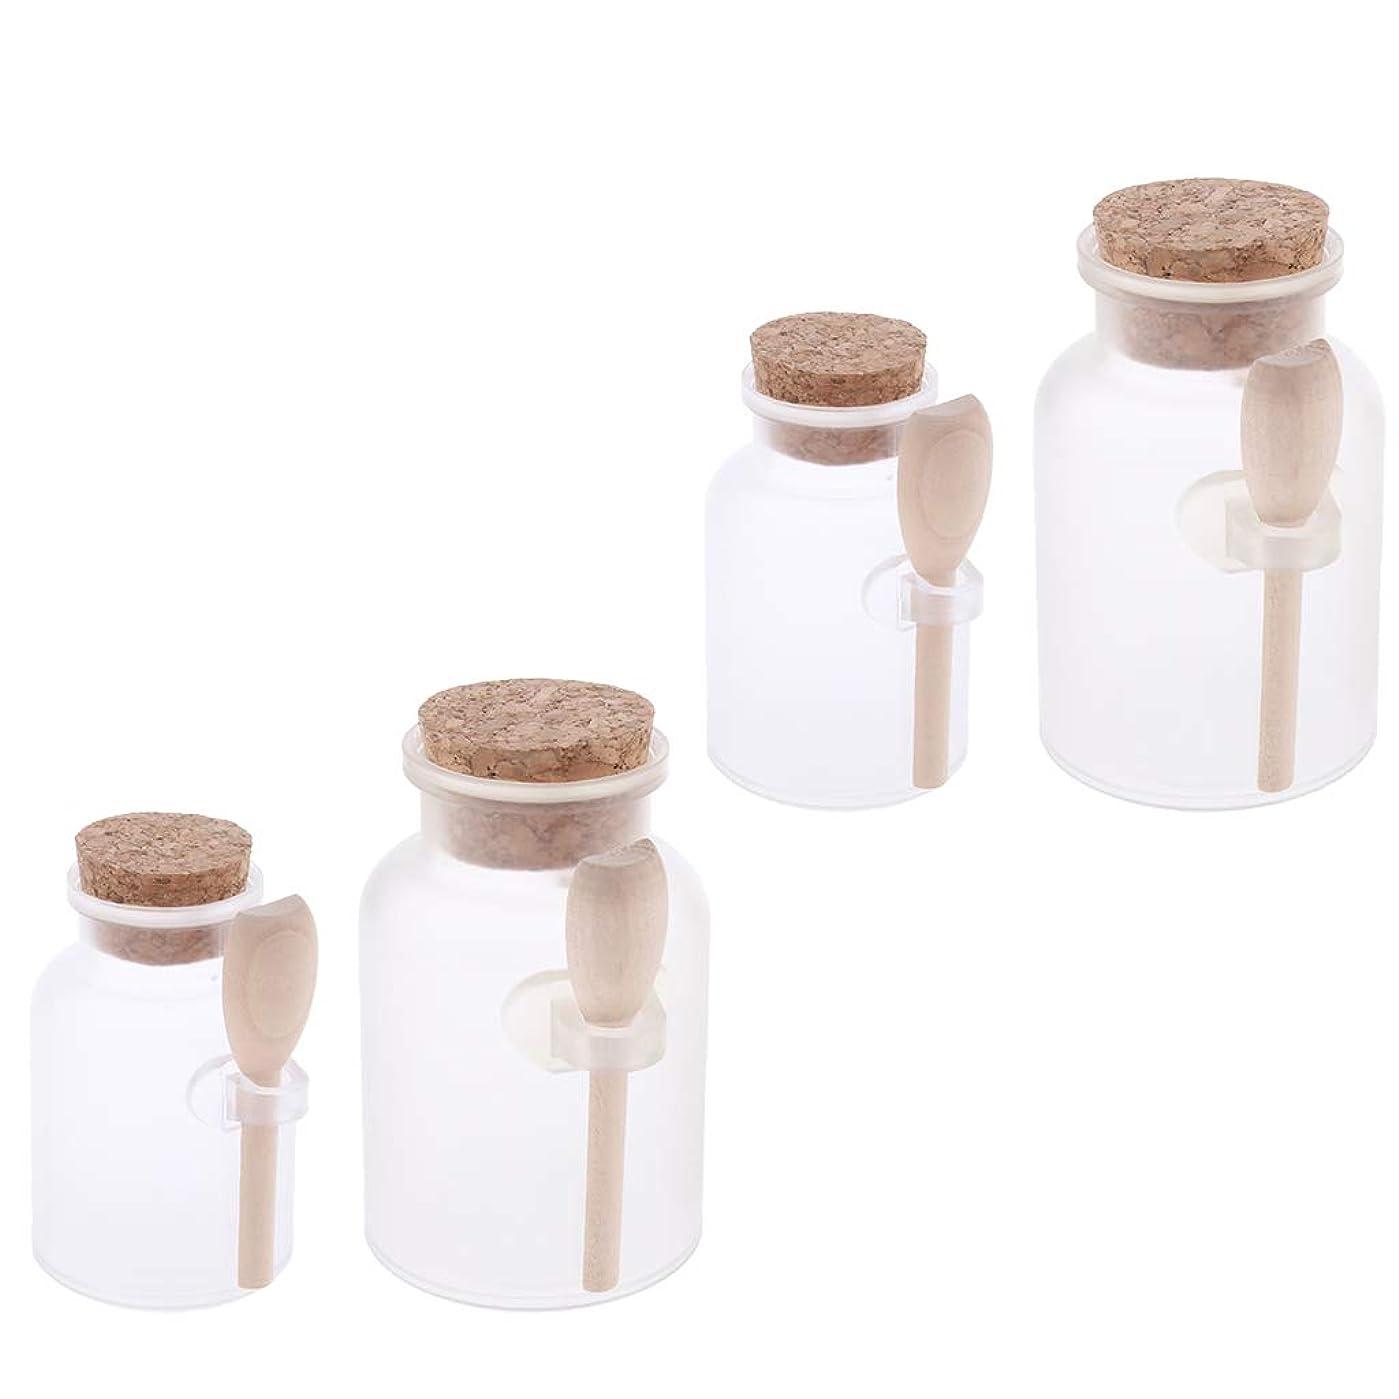 Hellery 4個入り クリーム瓶 クリームボトル アロマボトル バスソルト容器 化粧品ボトル 透明